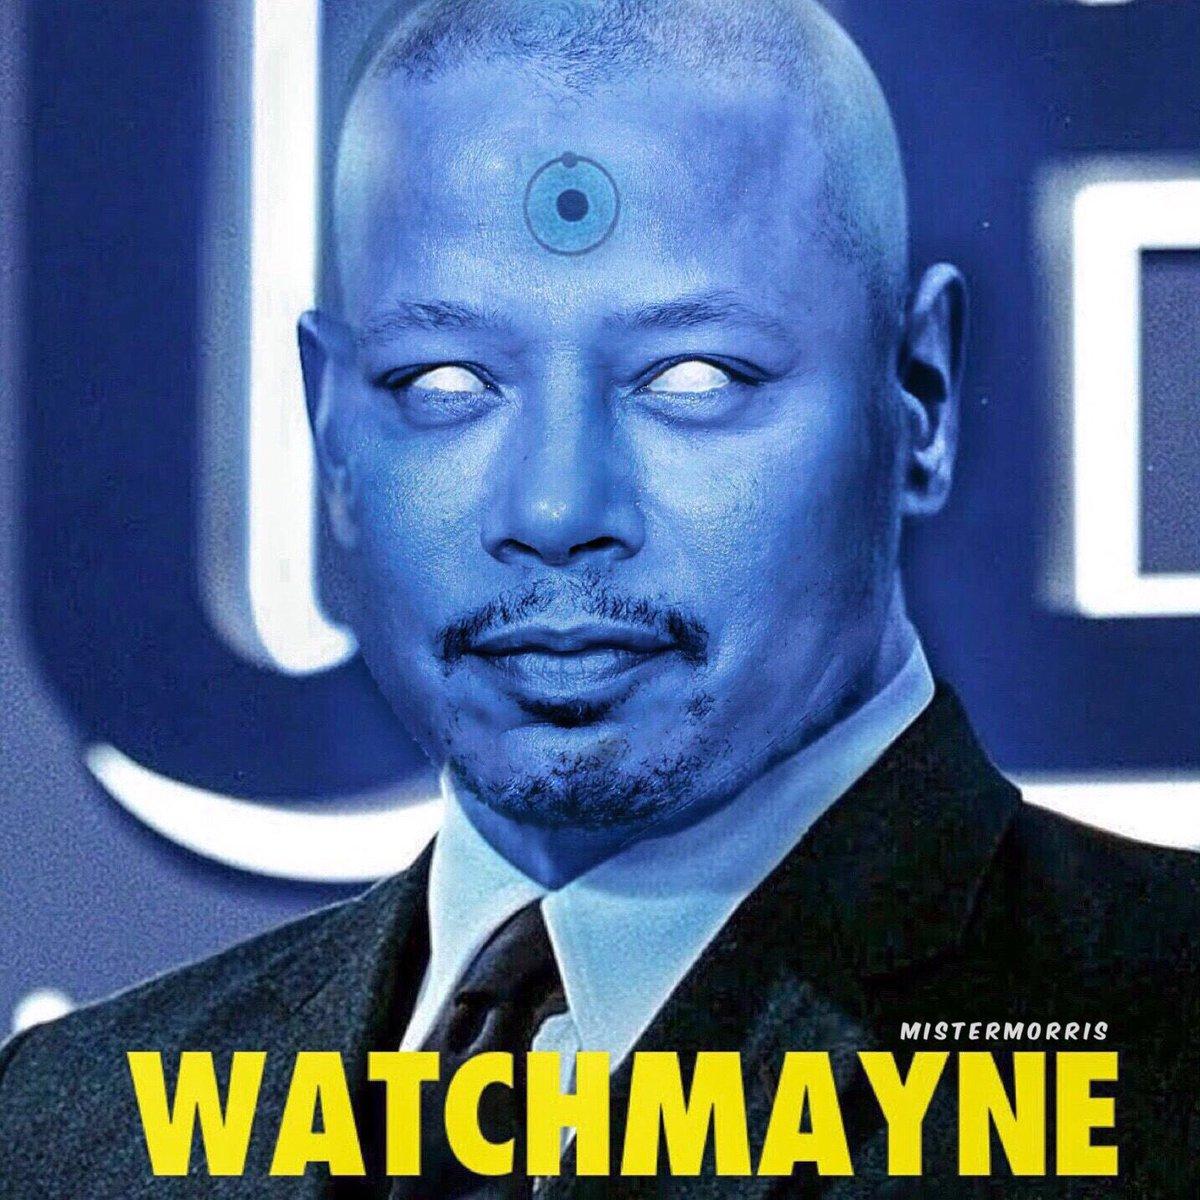 Image result for watchmayne